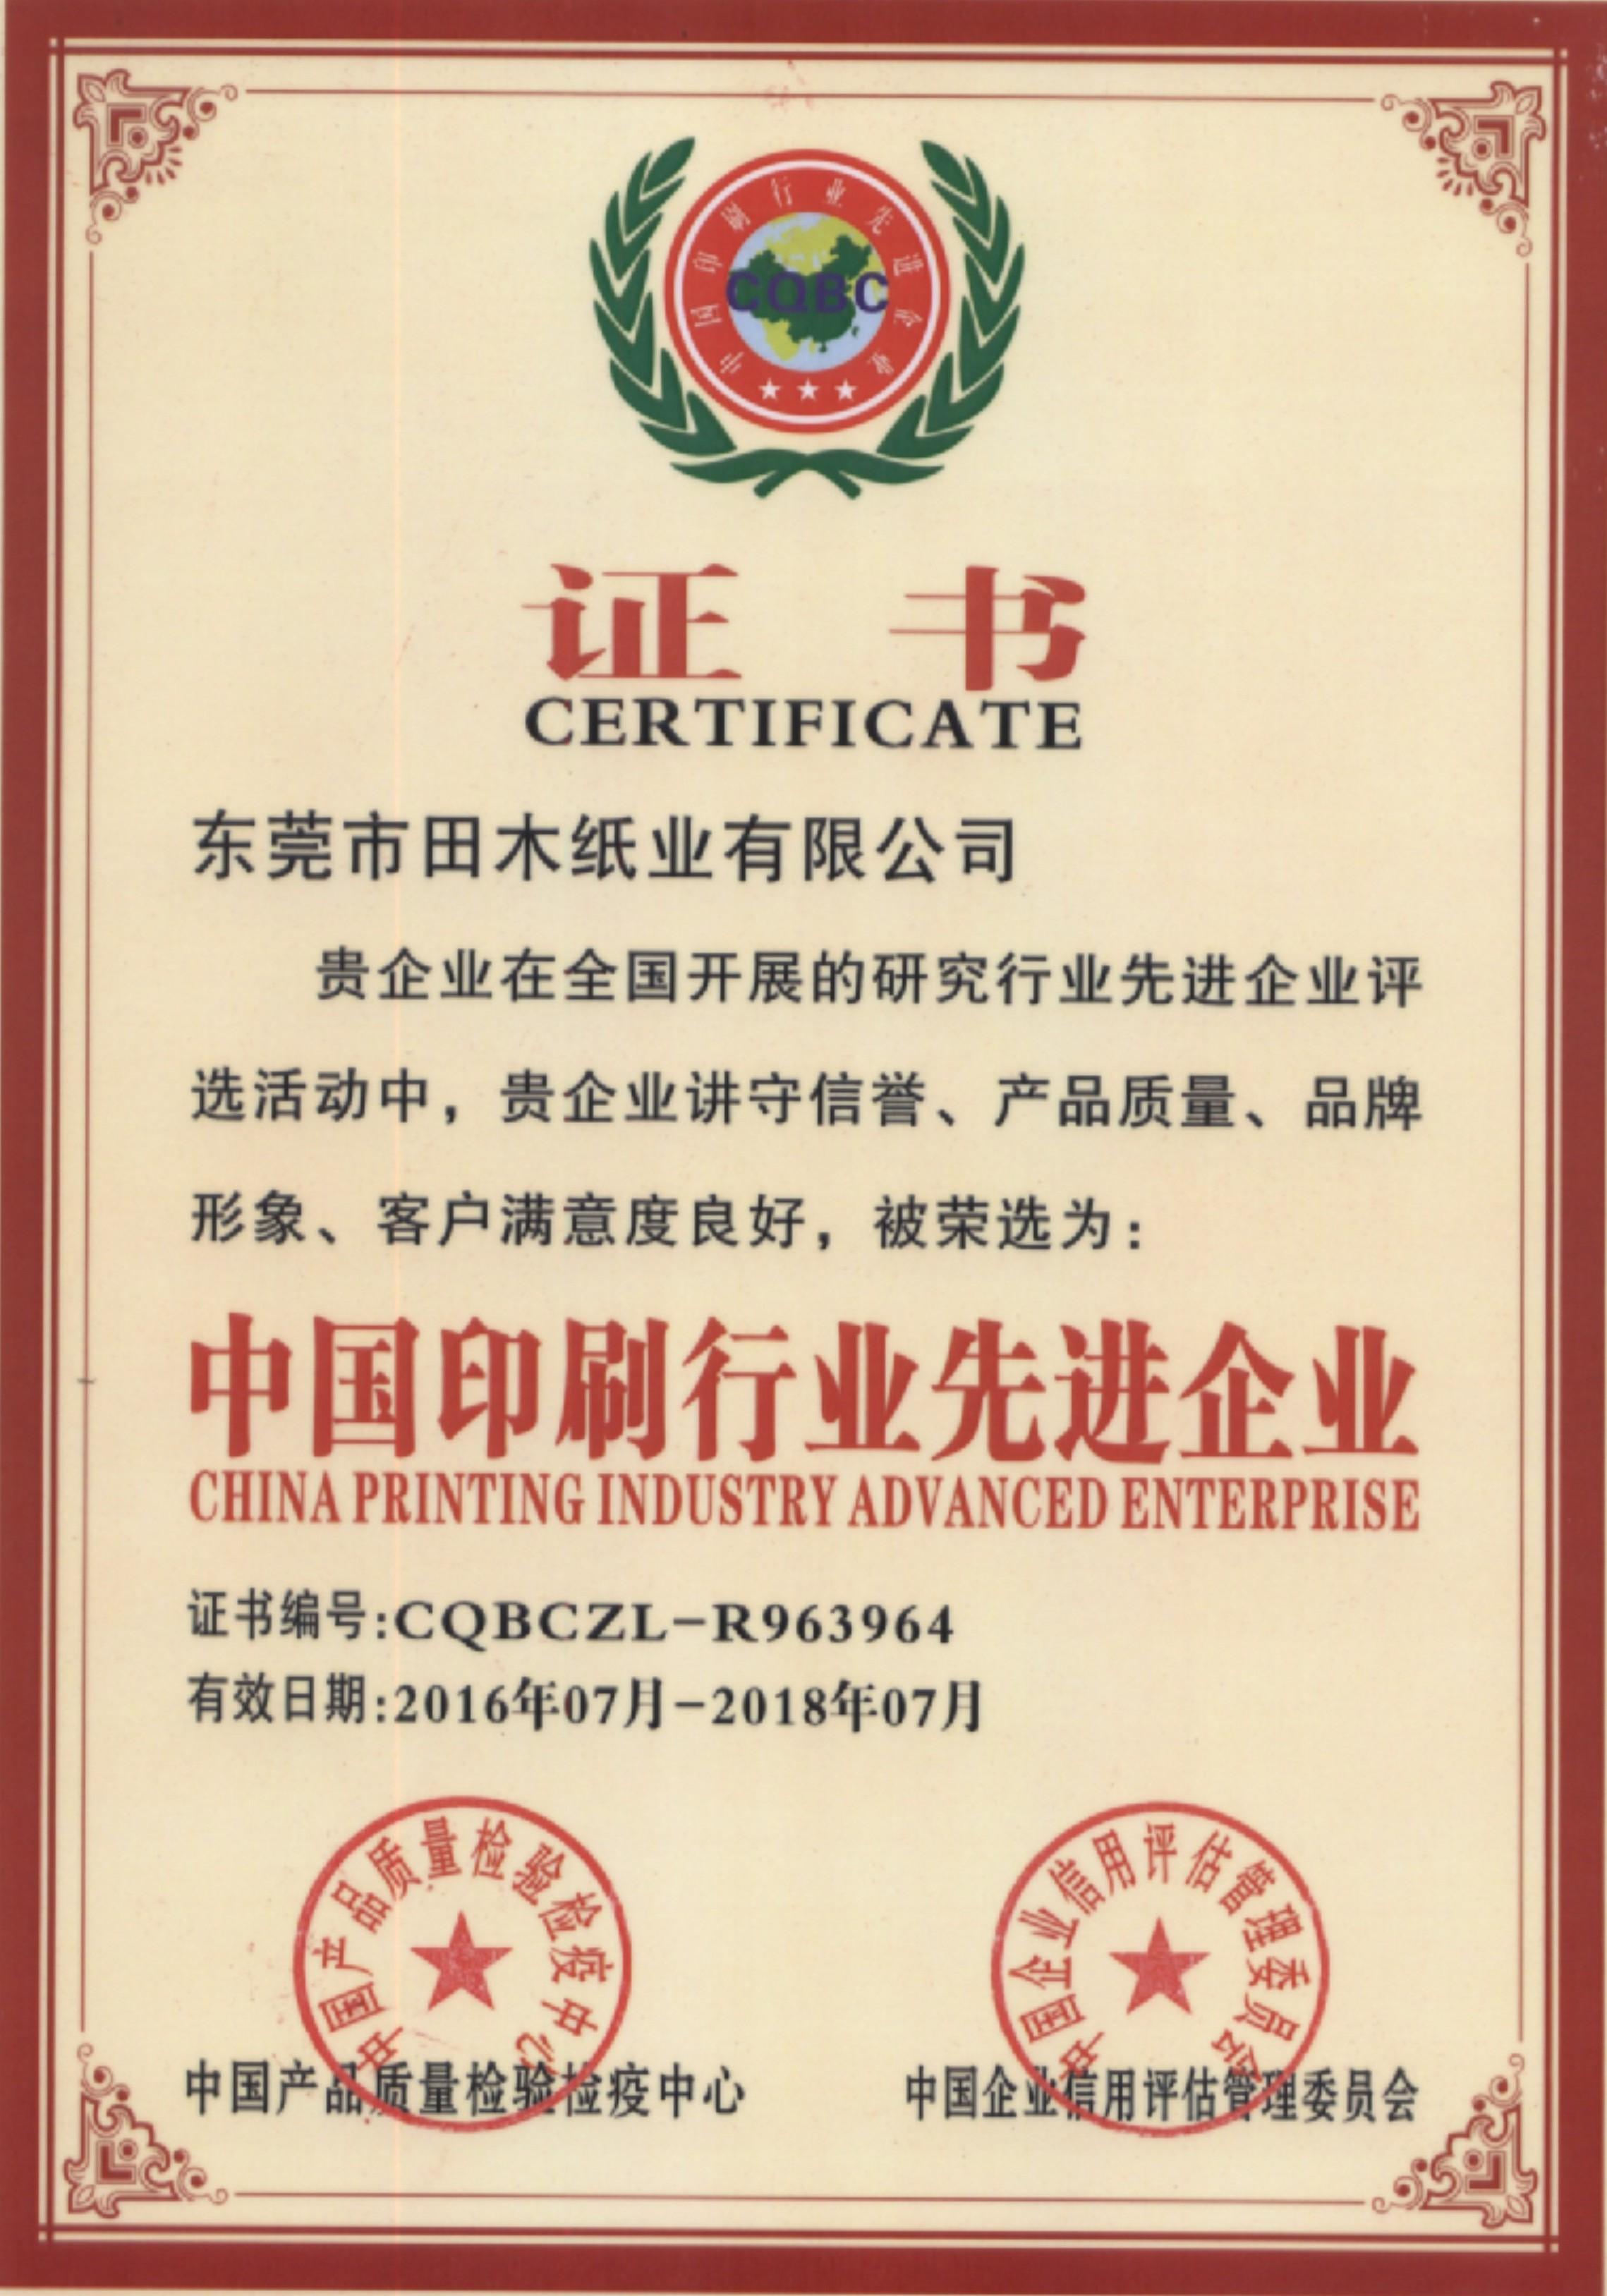 "<span style=""font-family:Microsoft YaHei;"">中国印刷行业先进企业</span>"